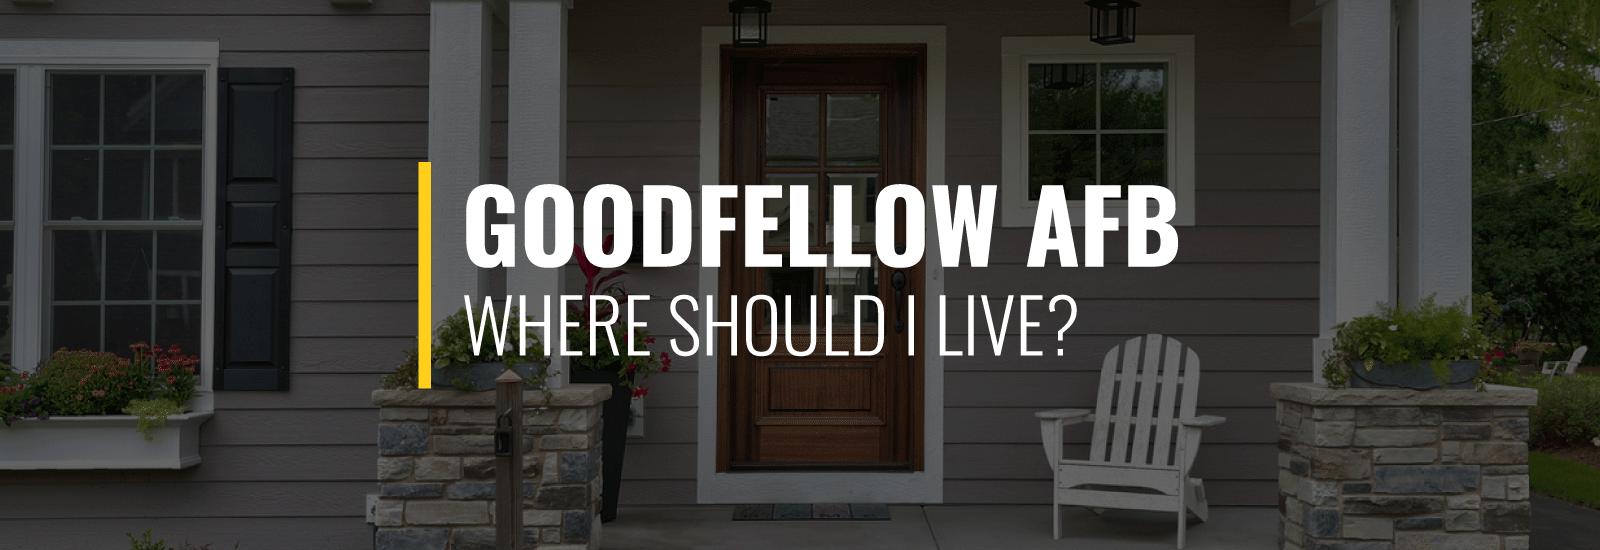 Where Should I Live Near Goodfellow Air Force Base?